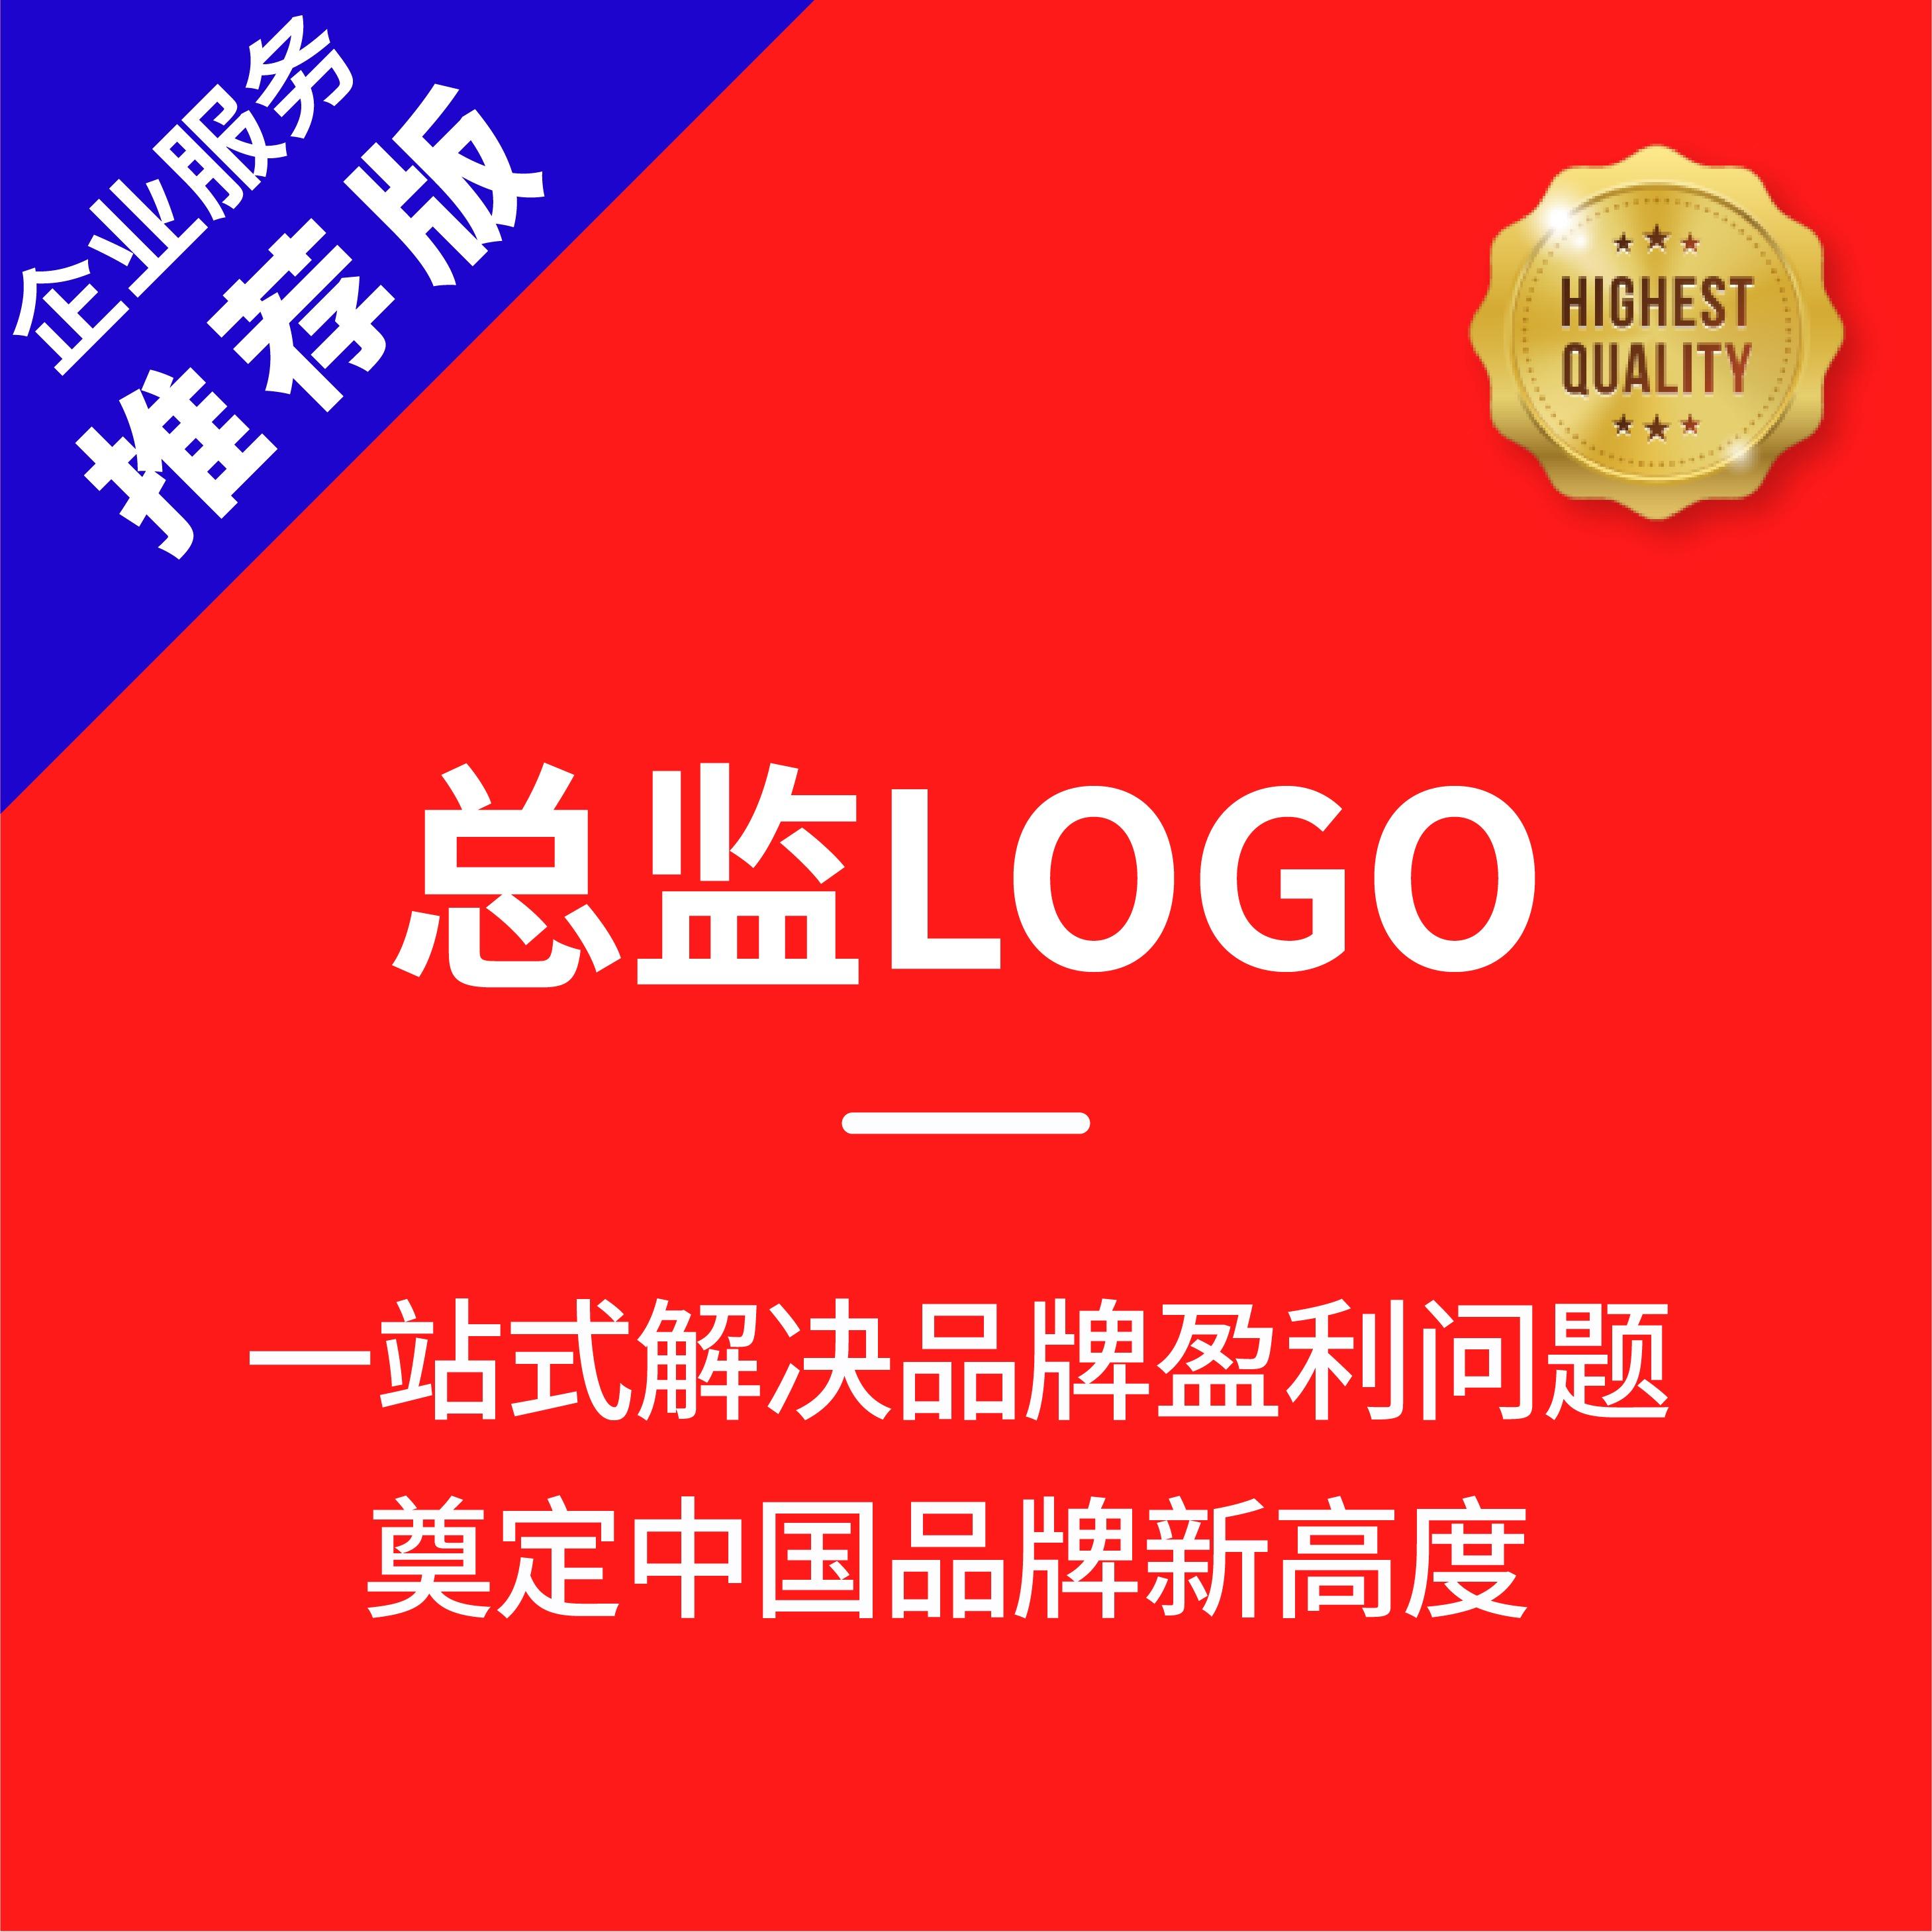 LOGO设计品牌VI定制注册商标公司企业餐饮农业医疗工业建筑